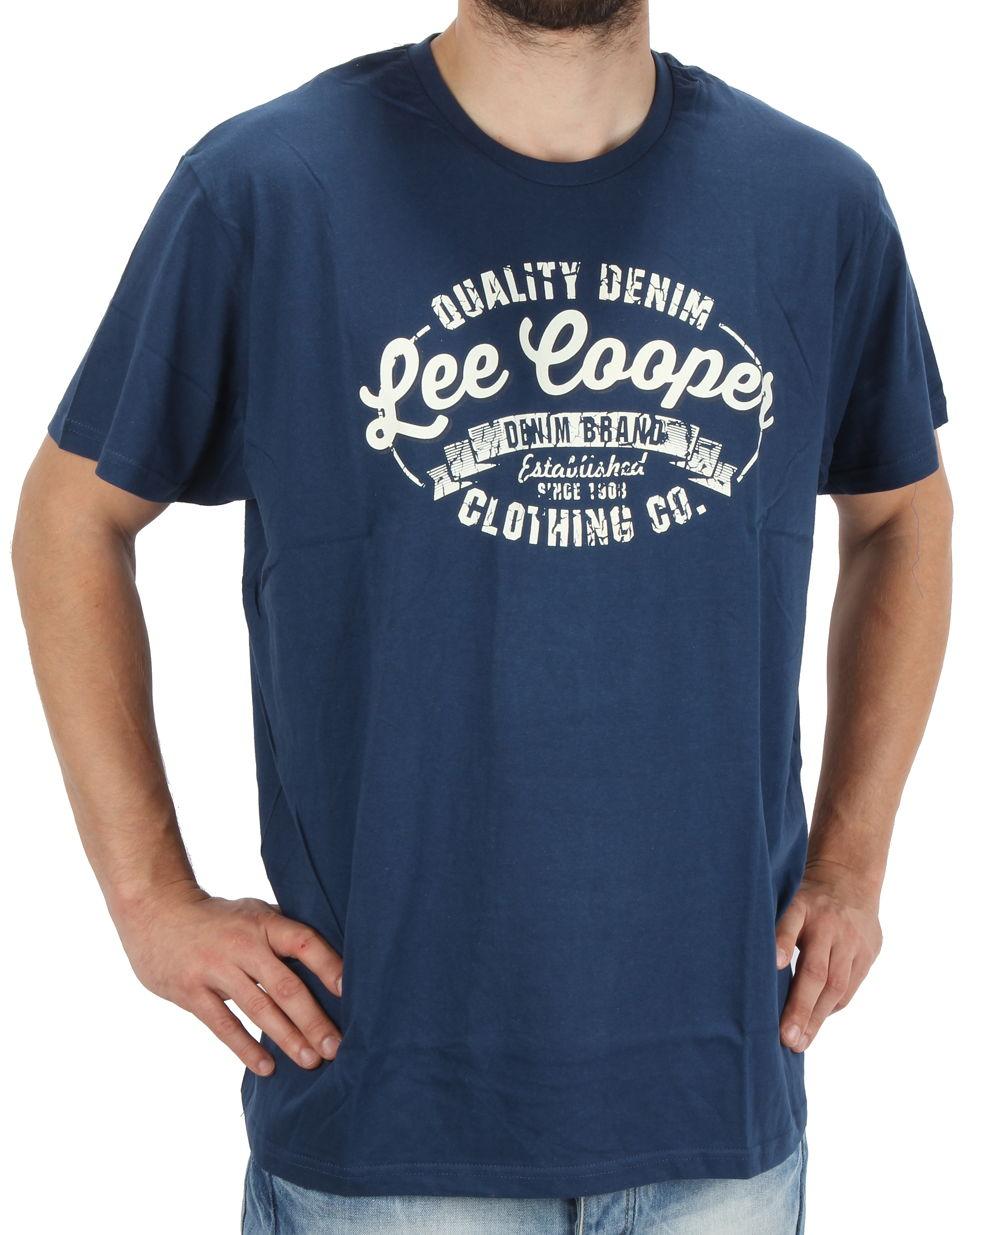 5b73d6225 Pánske tričko s krátkymi rukávmi Lee Cooper | hejmoda.sk